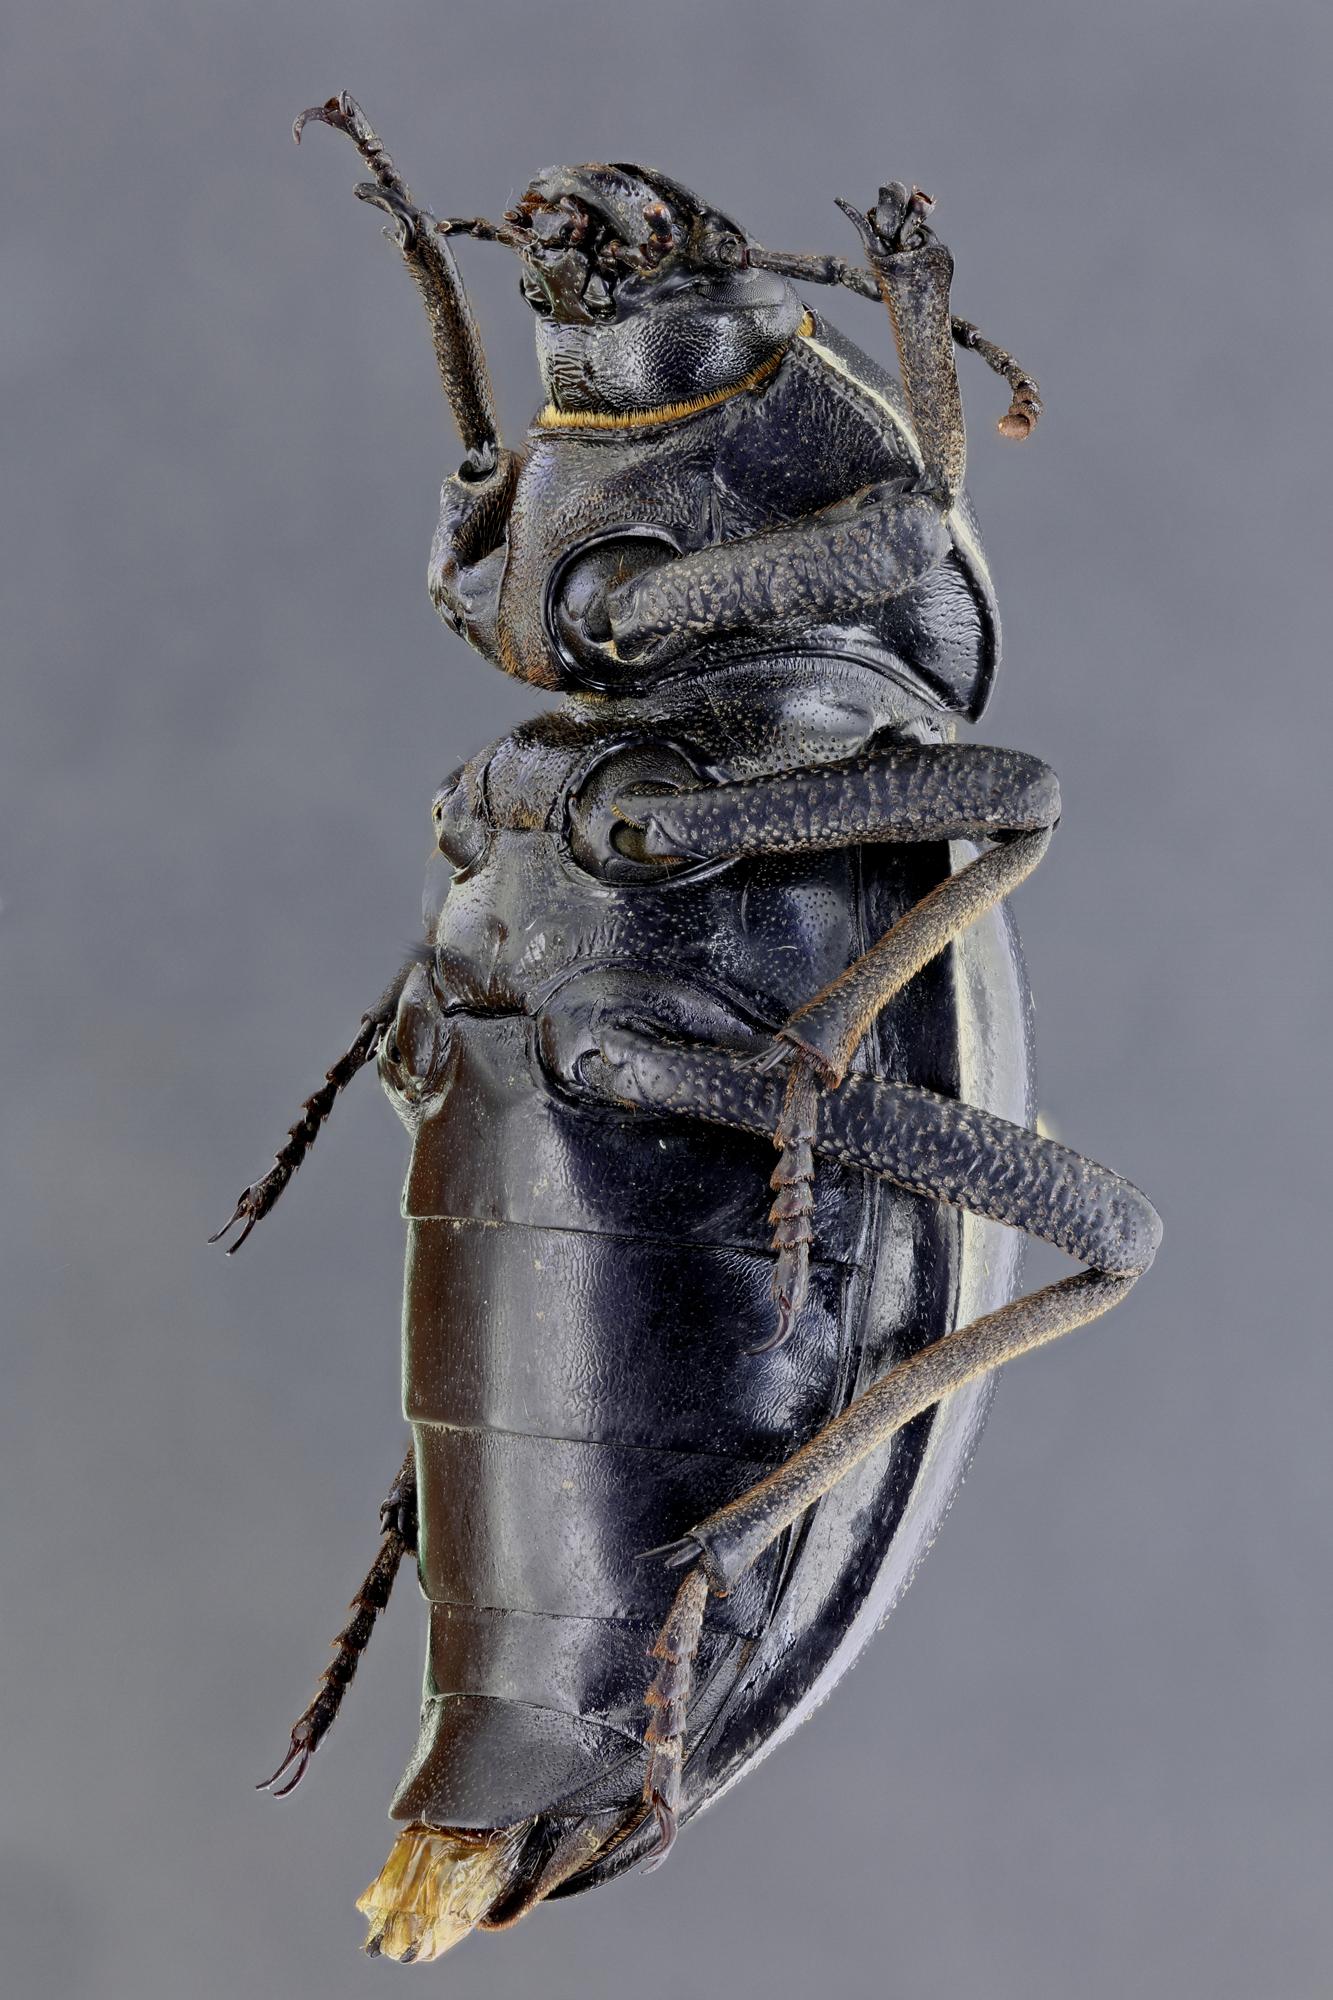 Phanerotomea arnoldi f 54900zs12.jpg